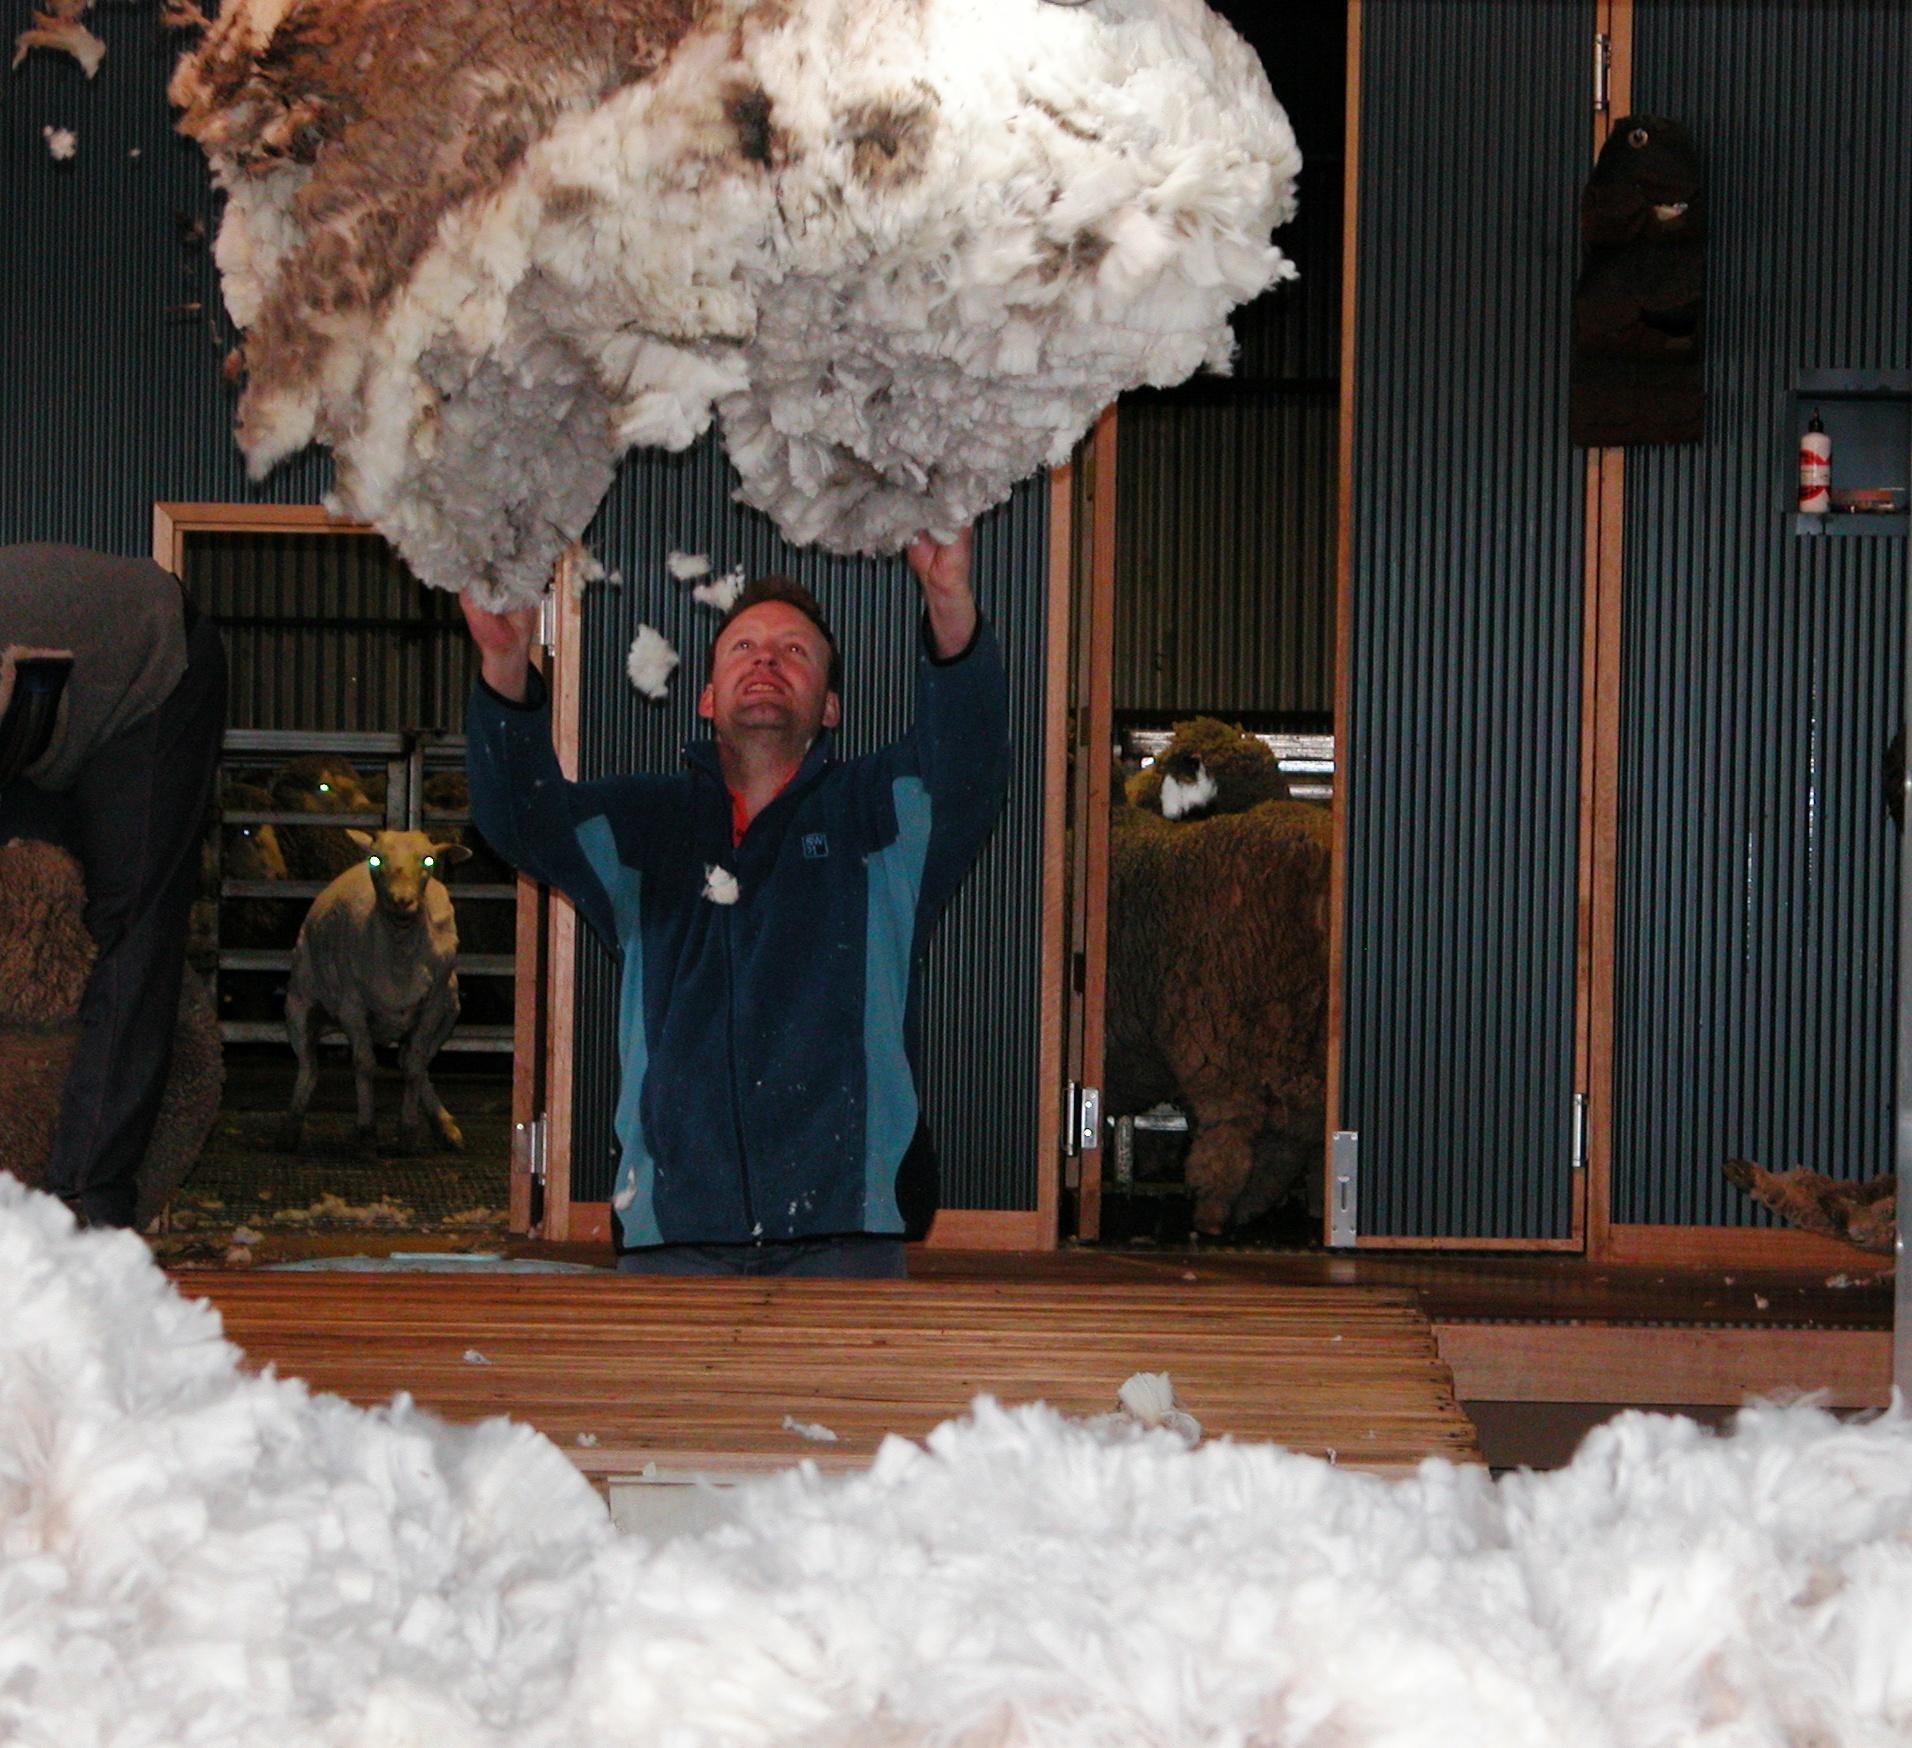 Fleece being thrown onto the skirting table